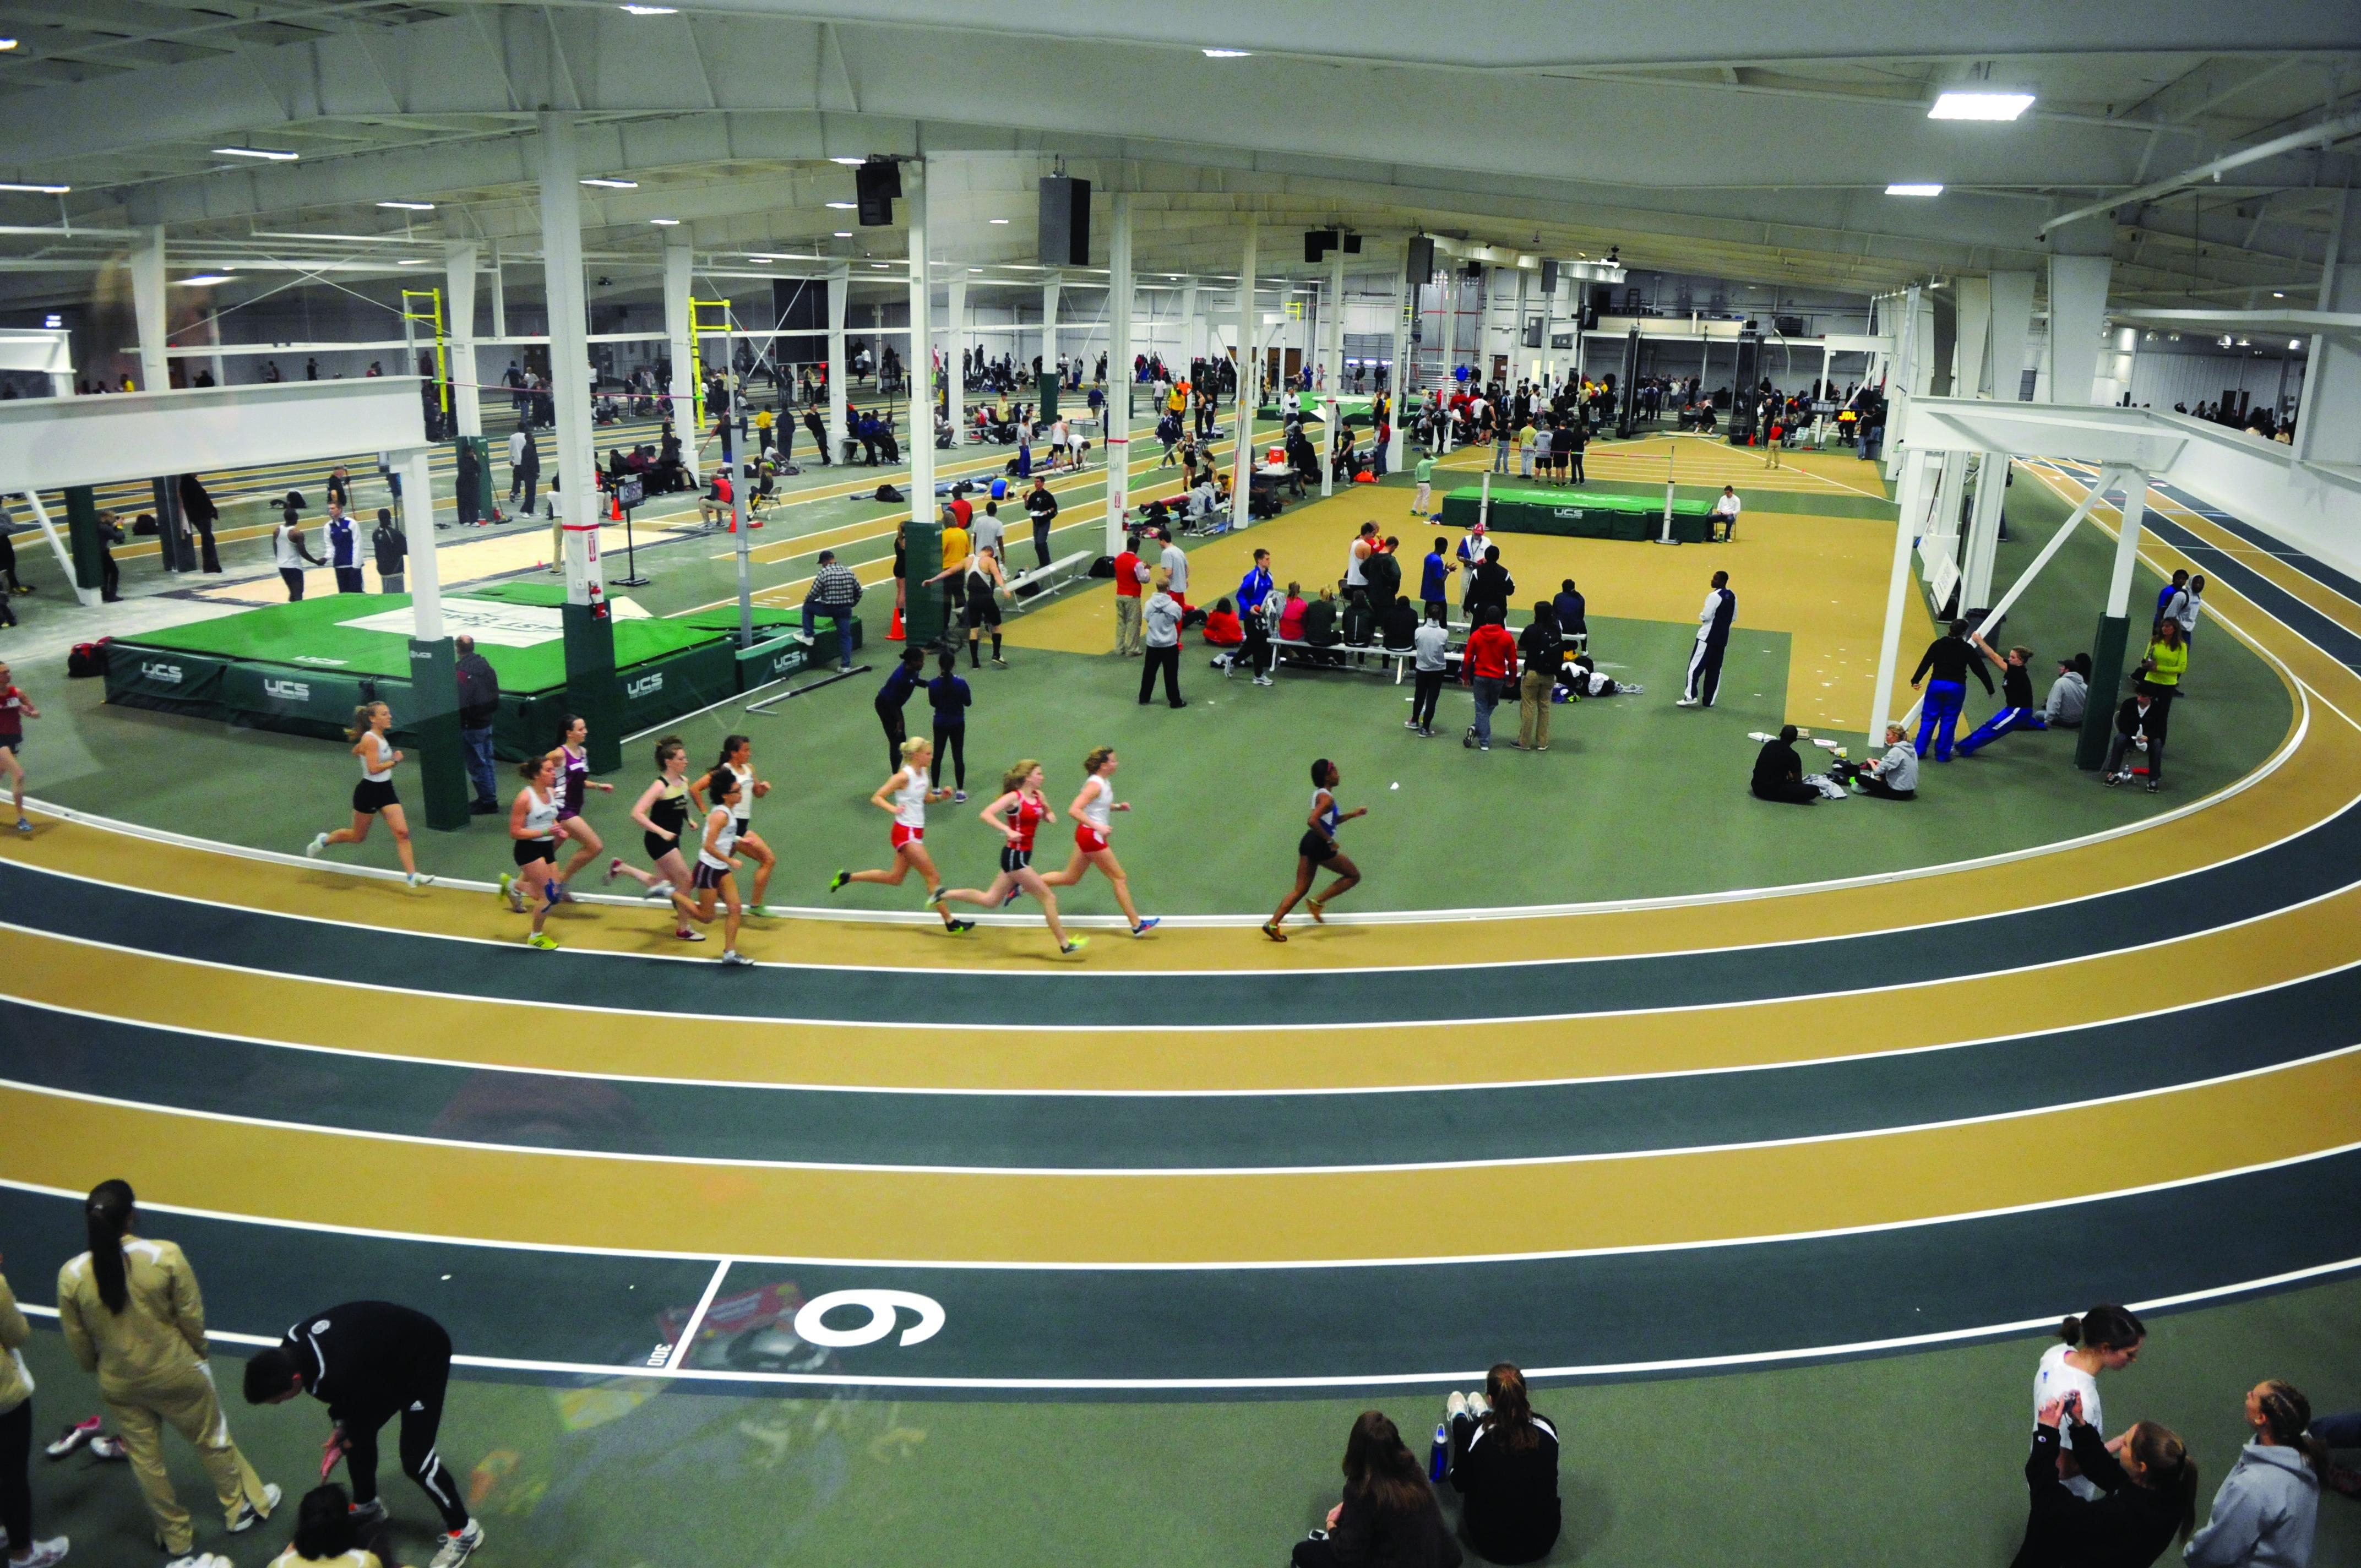 JDL Fast Track Indoor Track Facility